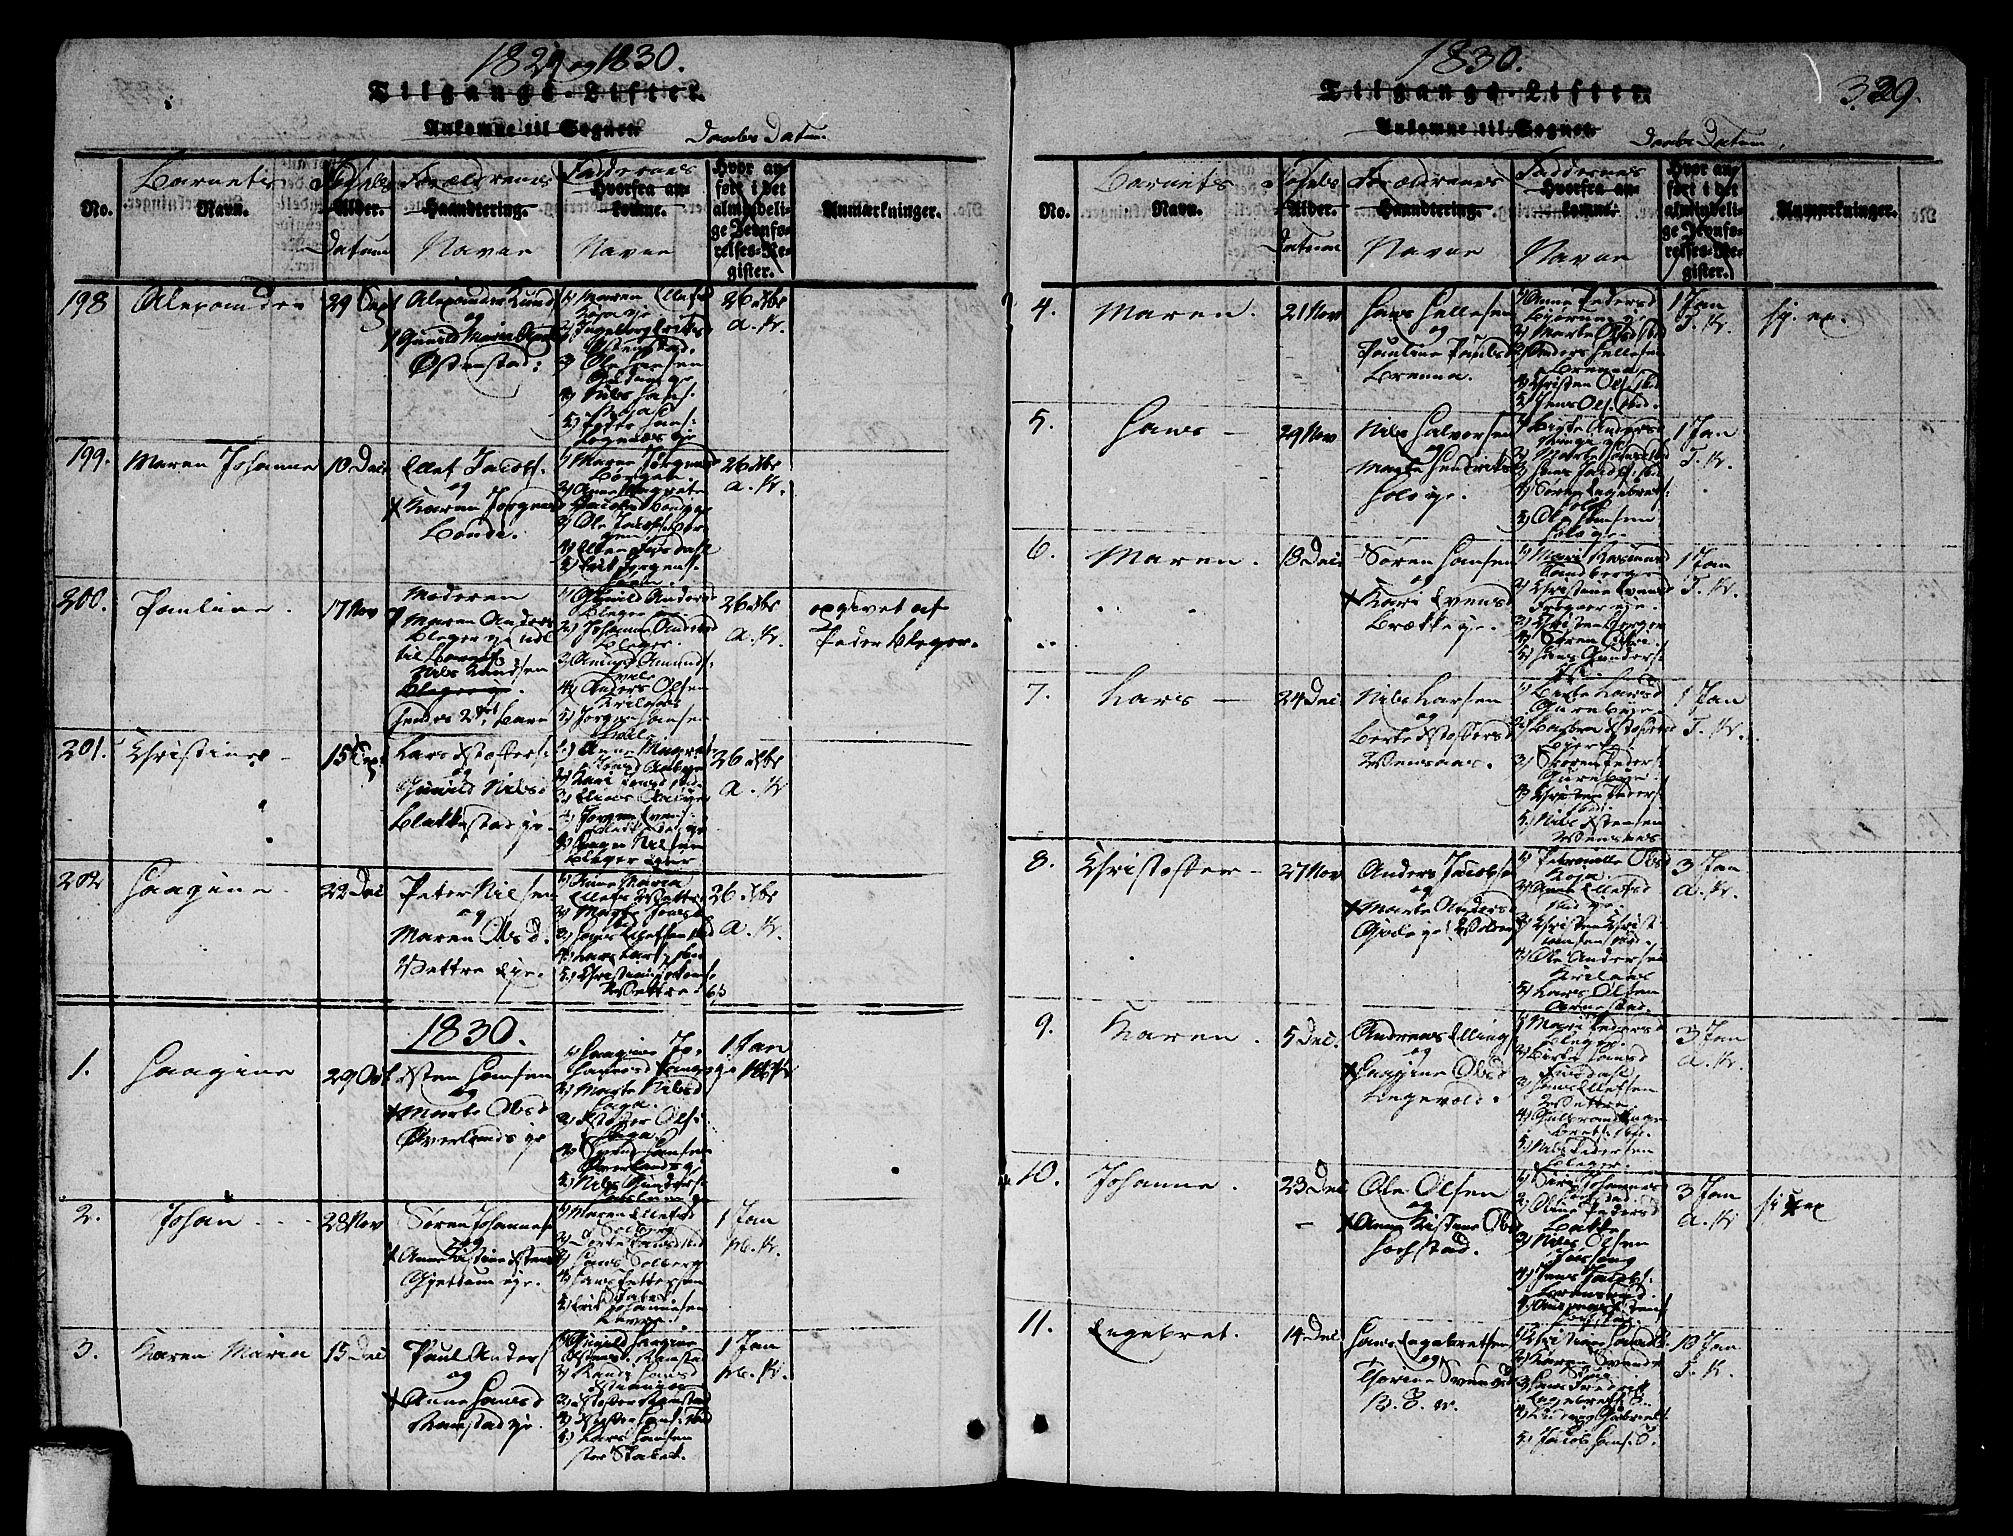 SAO, Asker prestekontor Kirkebøker, G/Ga/L0001: Klokkerbok nr. I 1, 1814-1830, s. 329